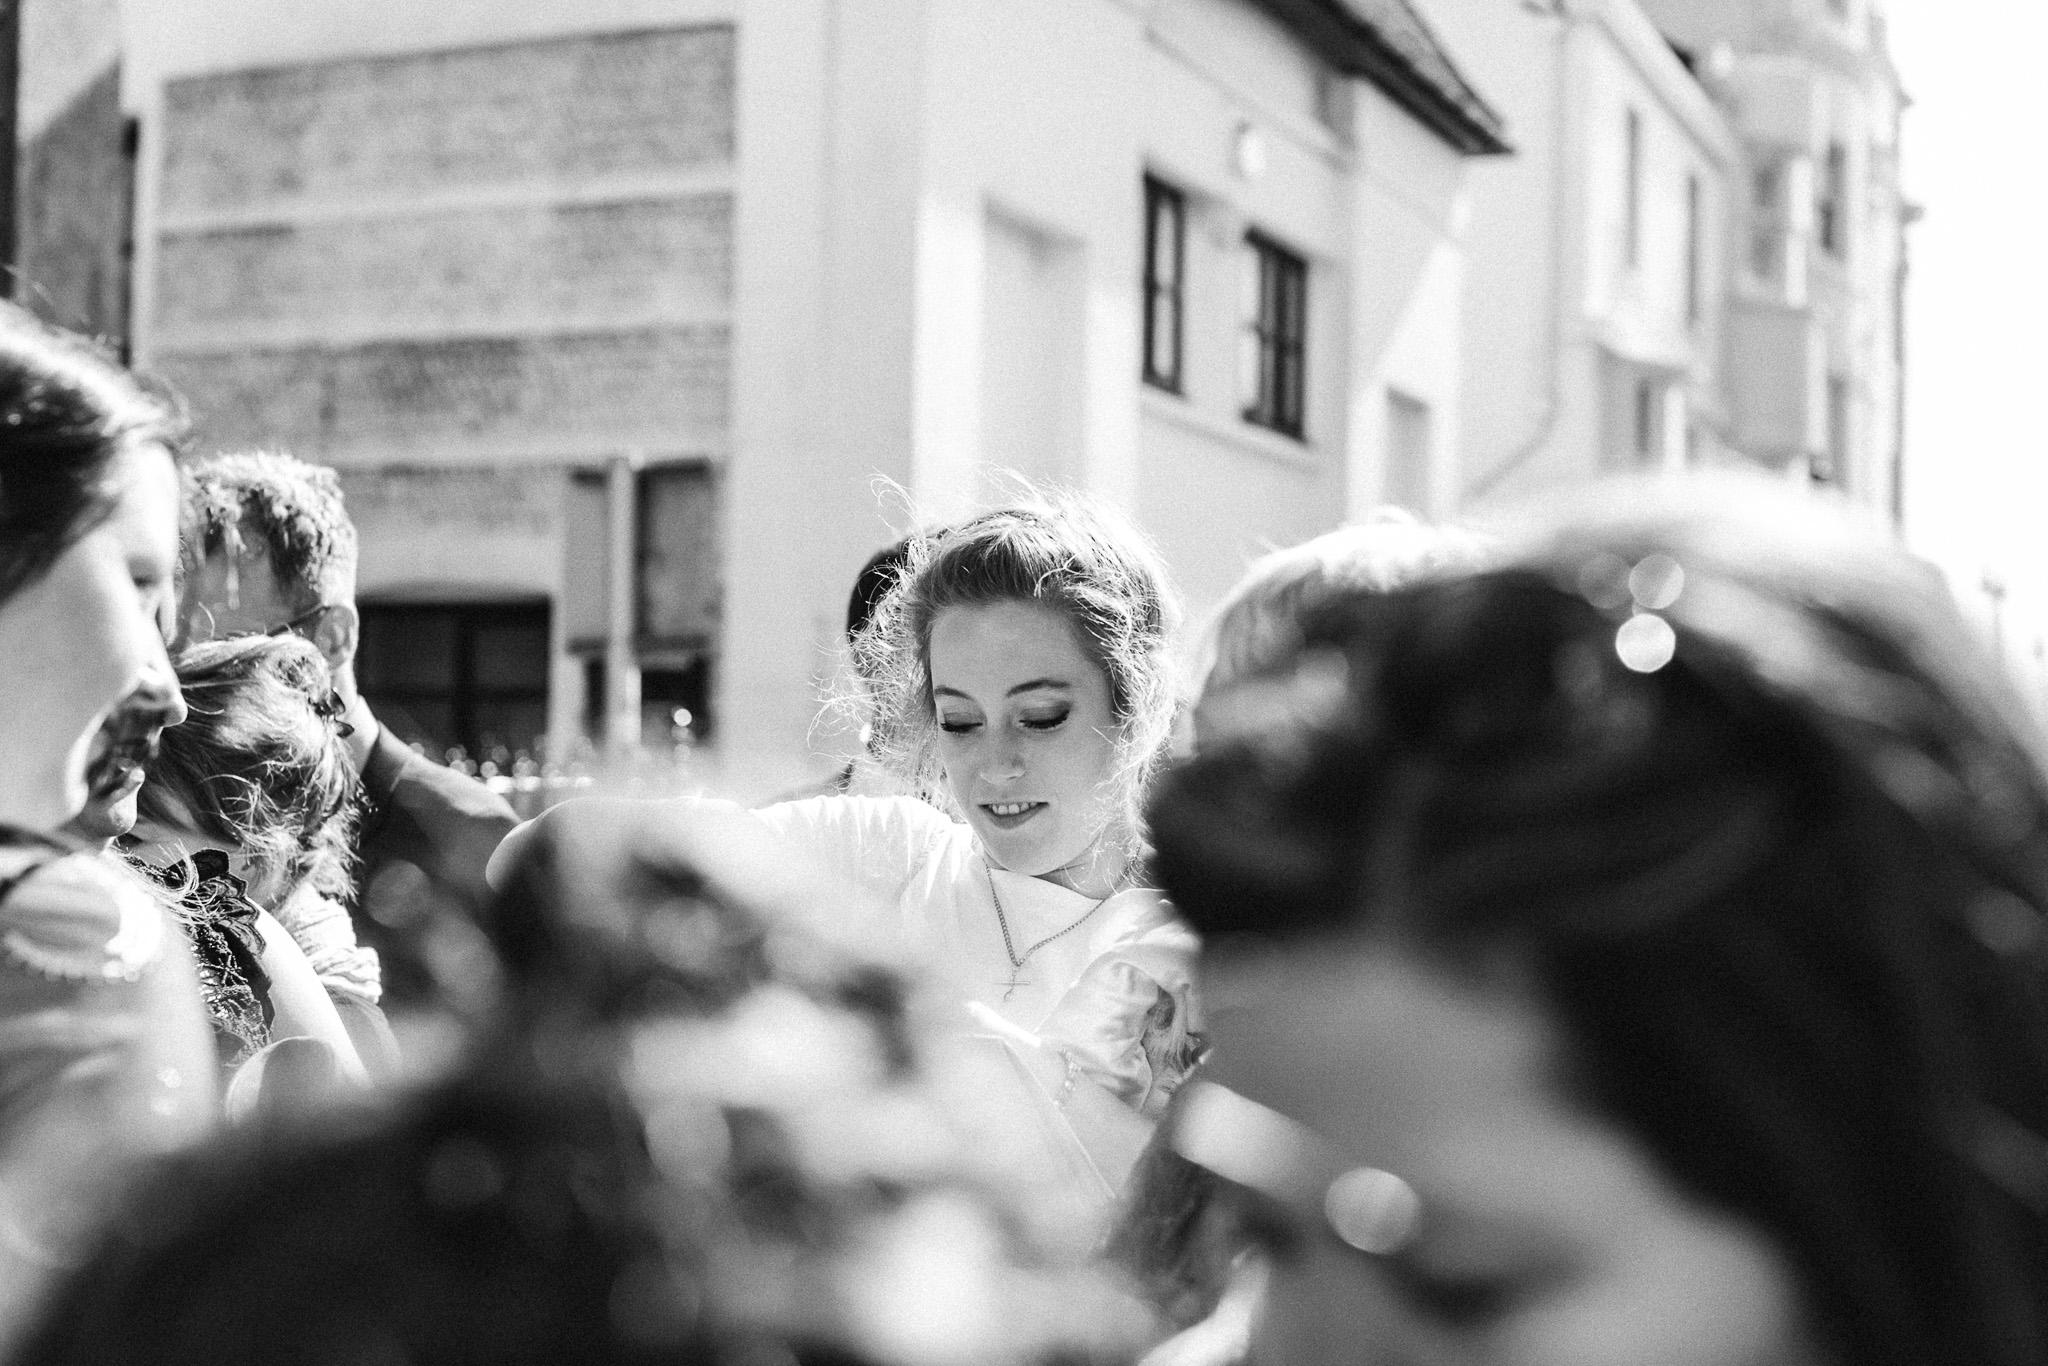 st_andrews_fabrica_brighton_wedding_566.jpg